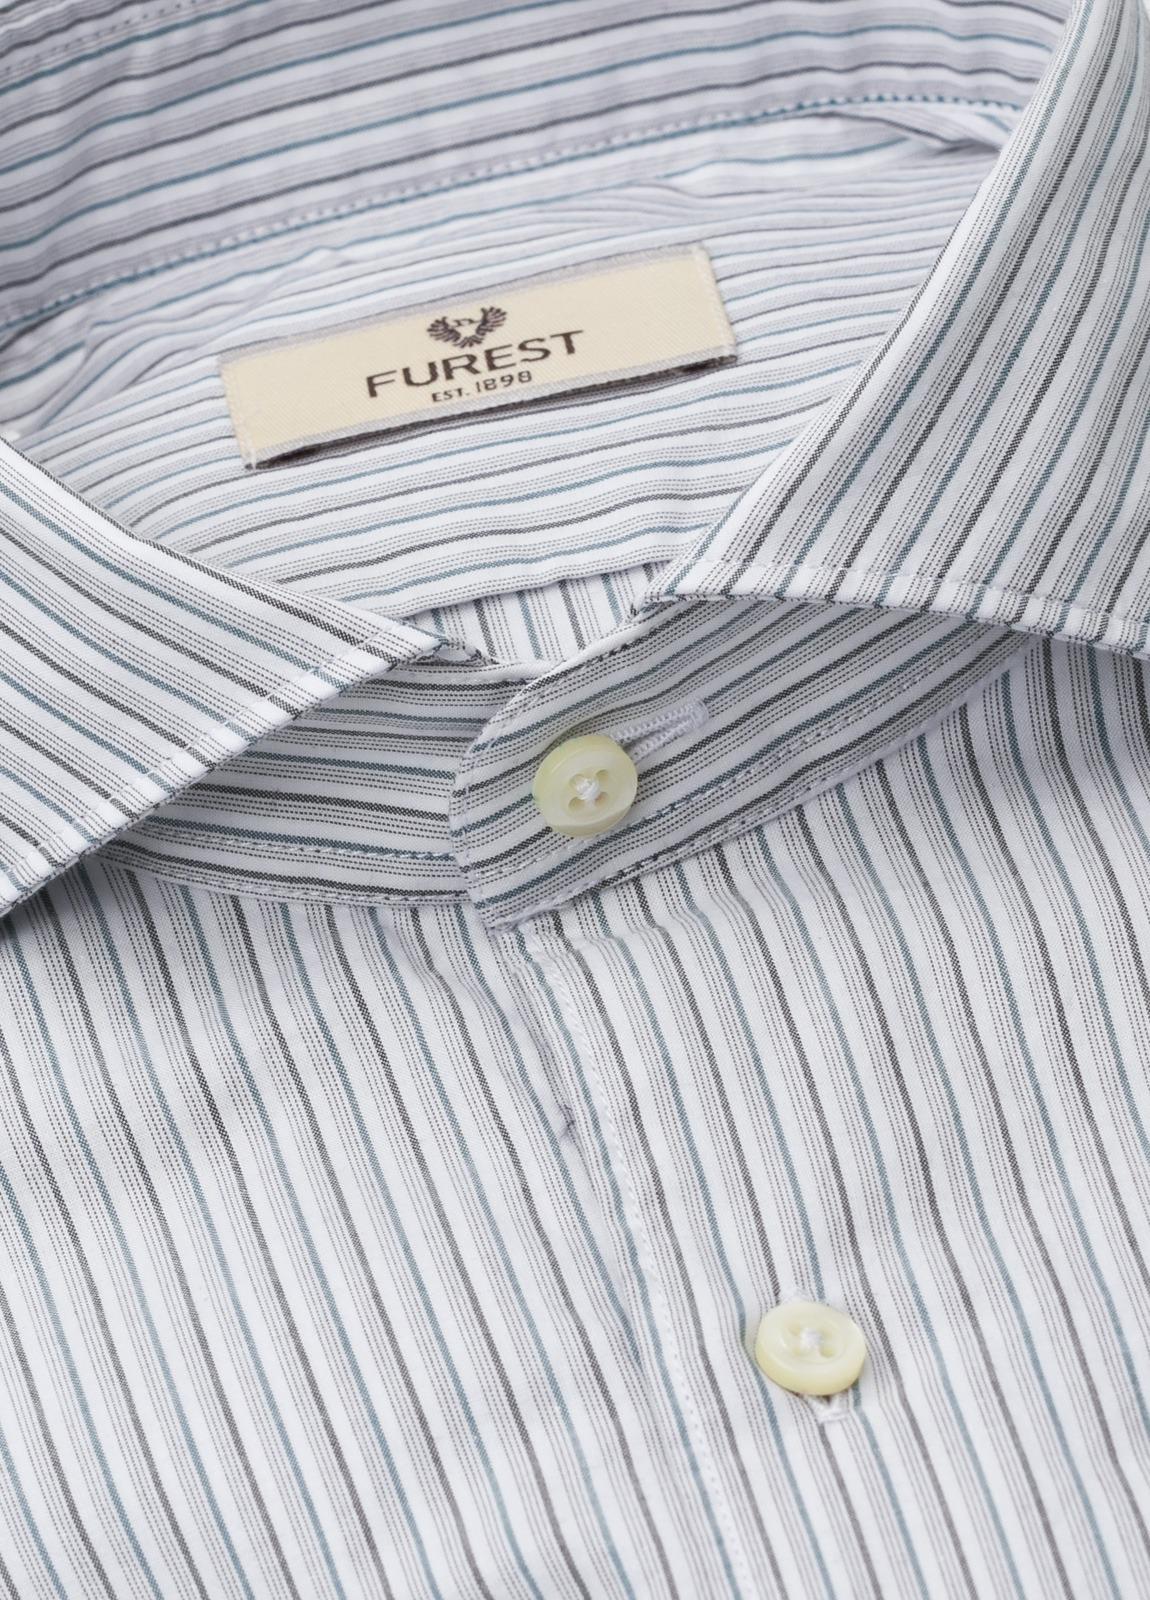 Camisa Leisure Wear SLIM FIT Modelo CAPRI, rayas gris, 100% Algodón. - Ítem1